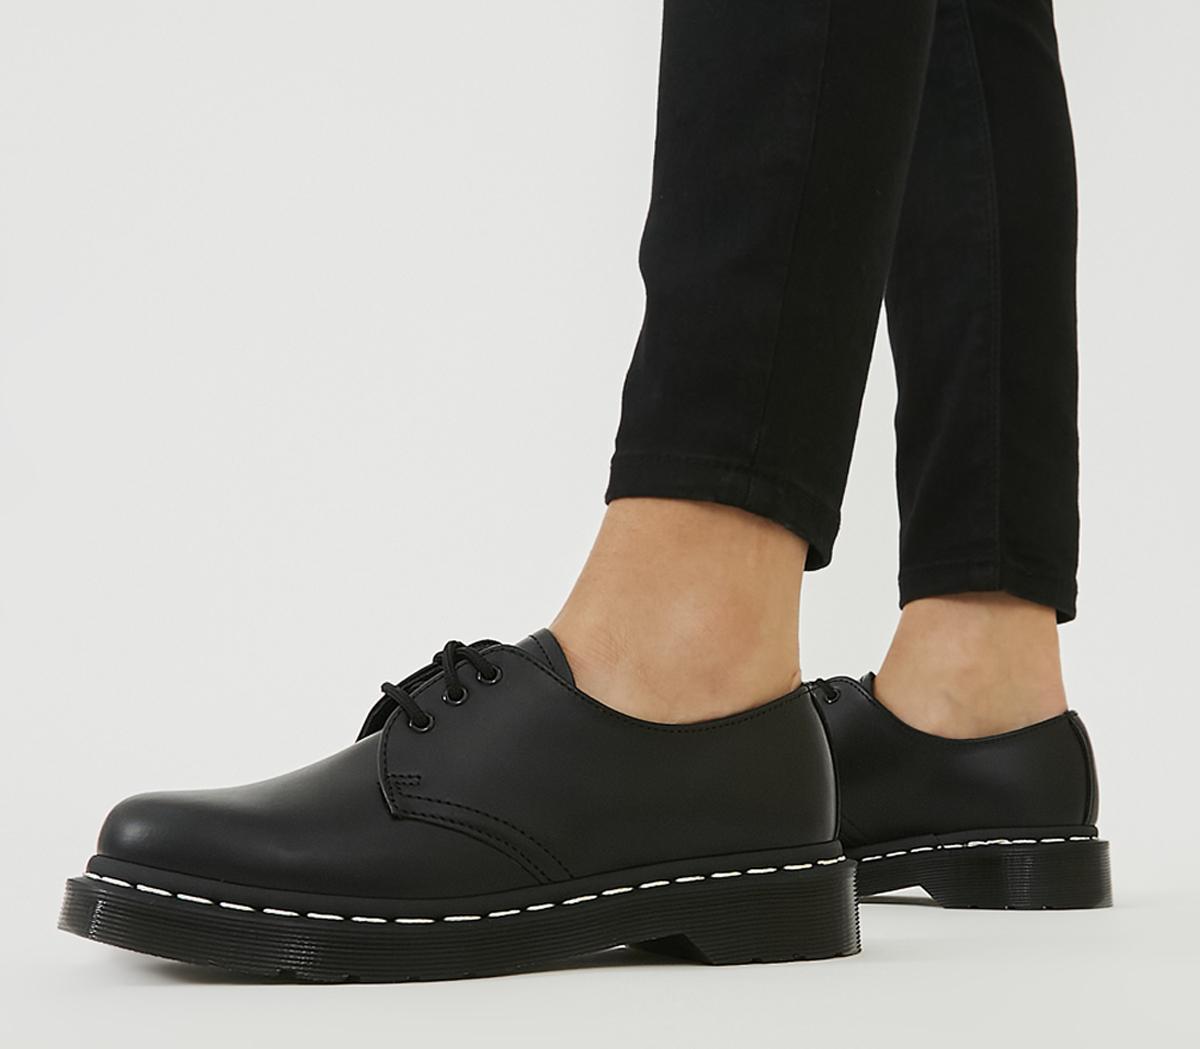 Dr. Martens 3 Eyelet Shoe Black White